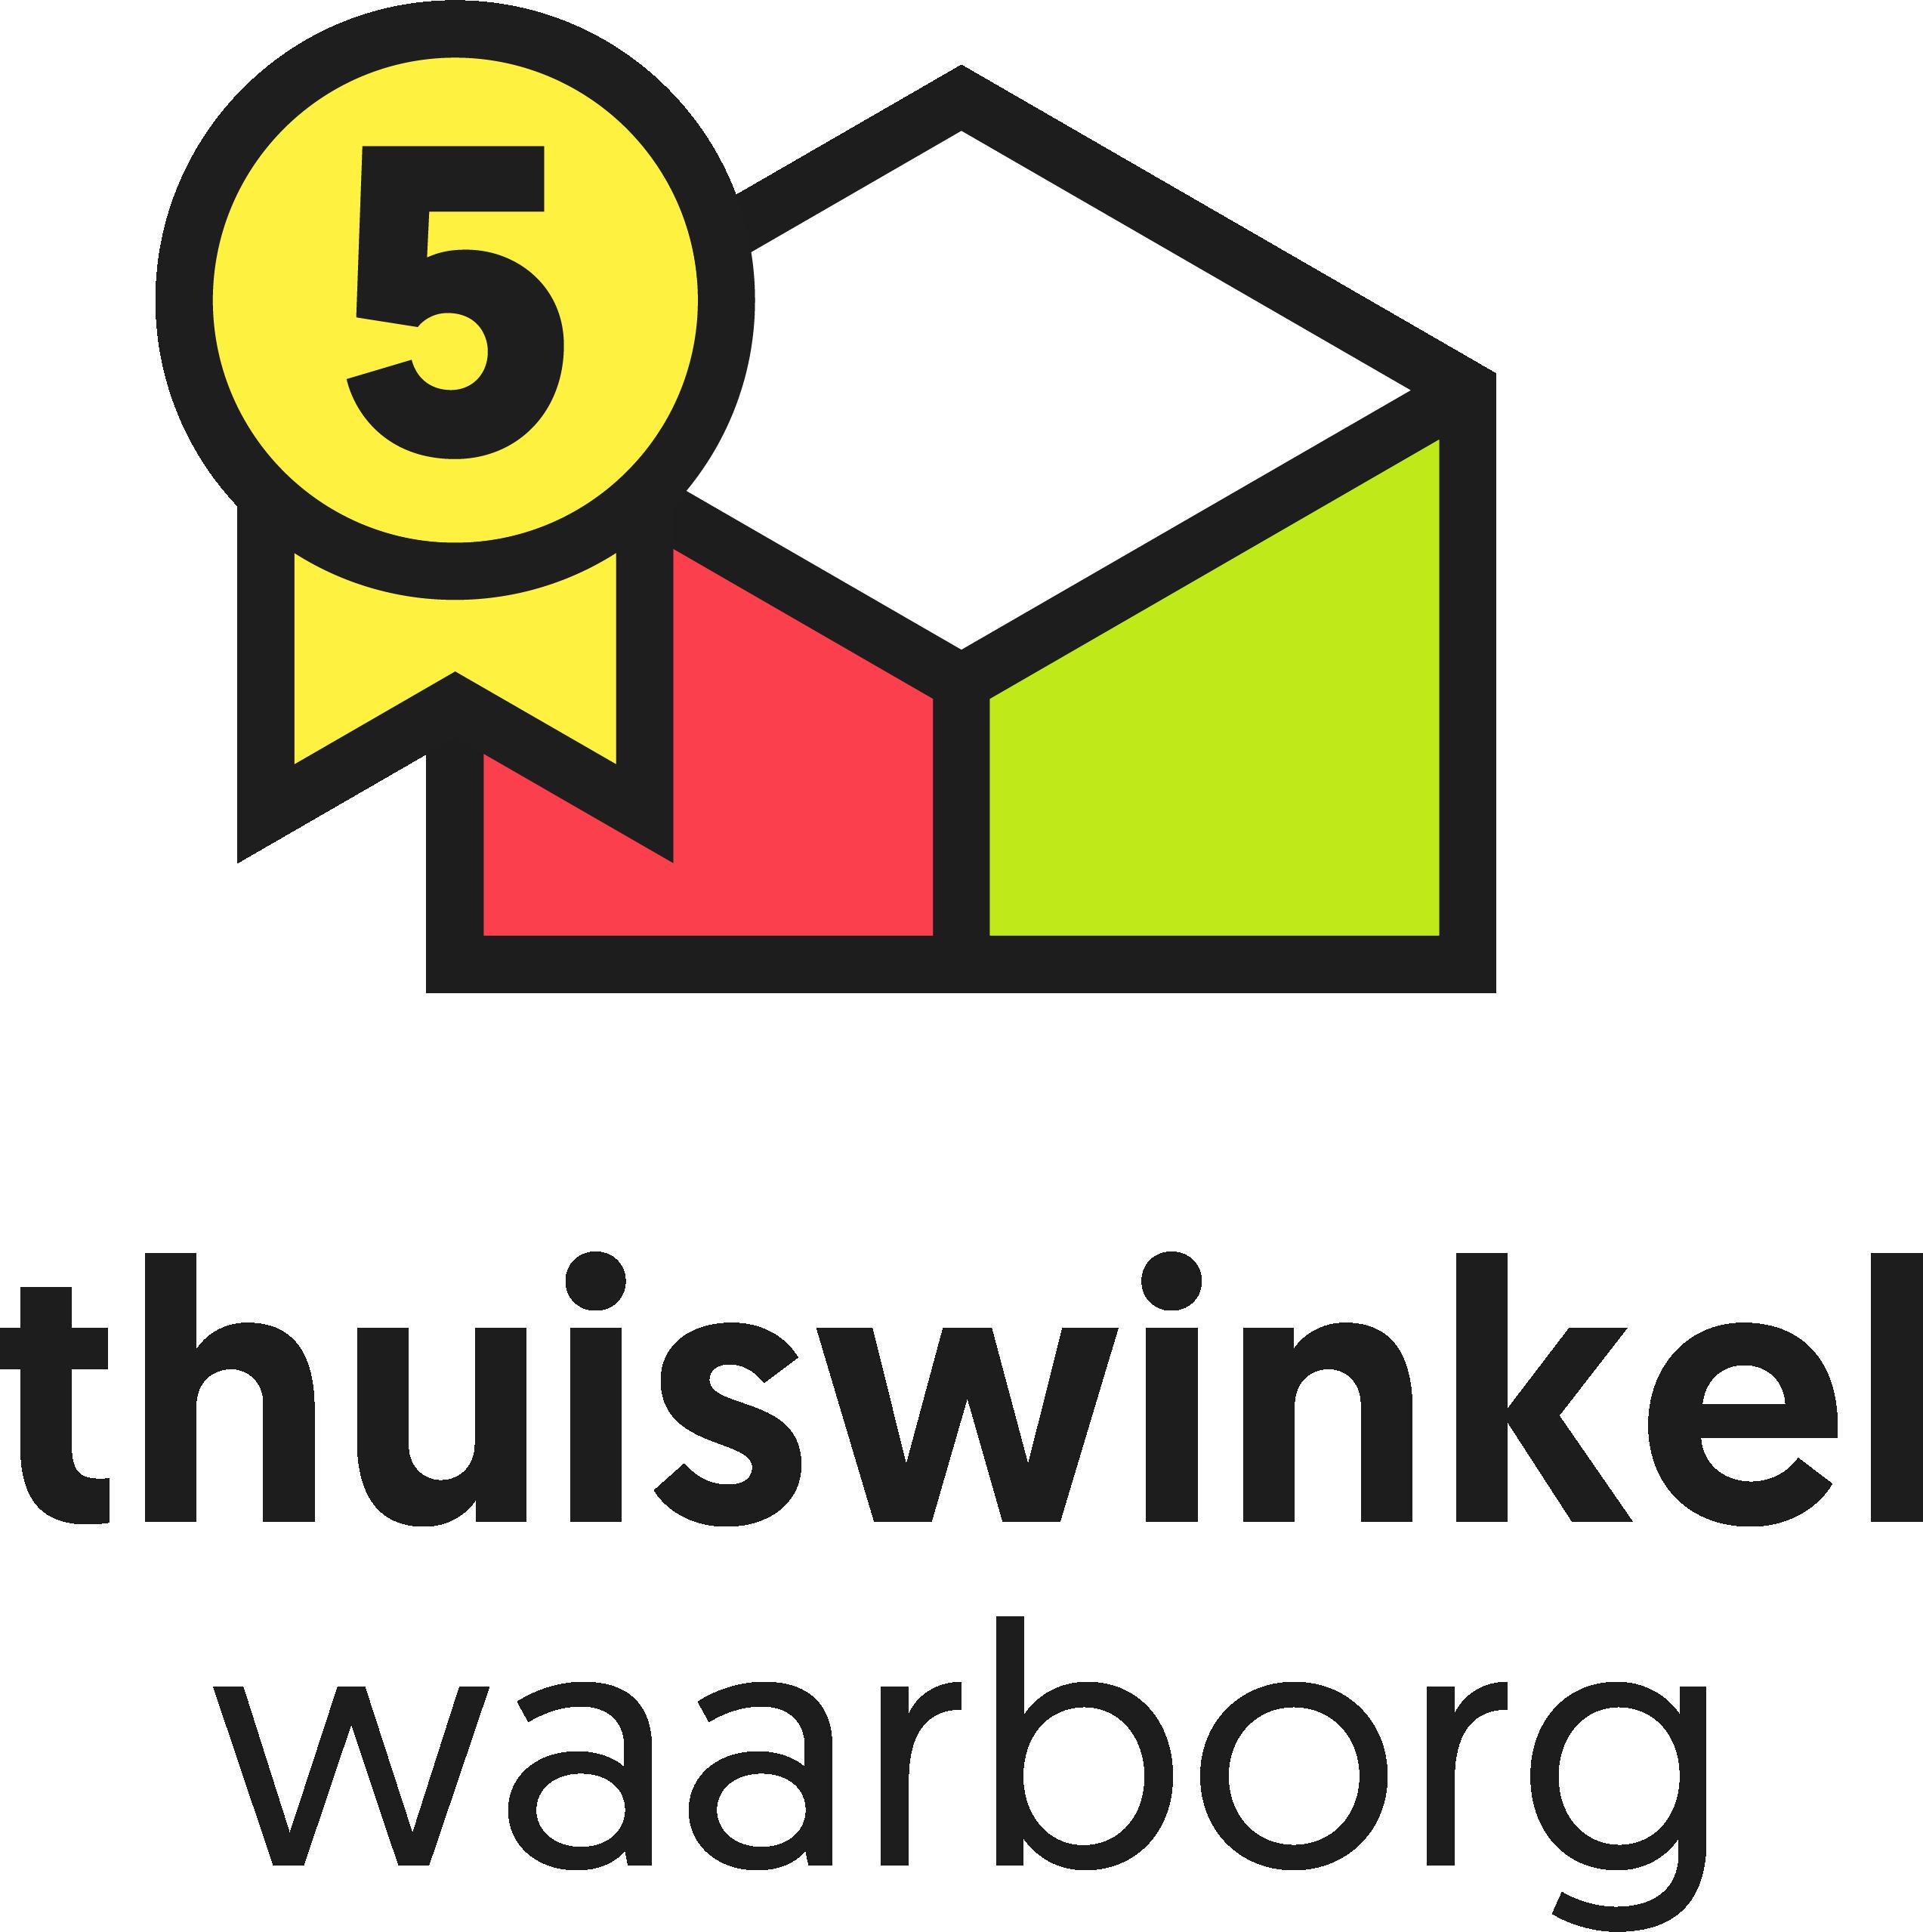 thuiswinkel_waarborg_logo